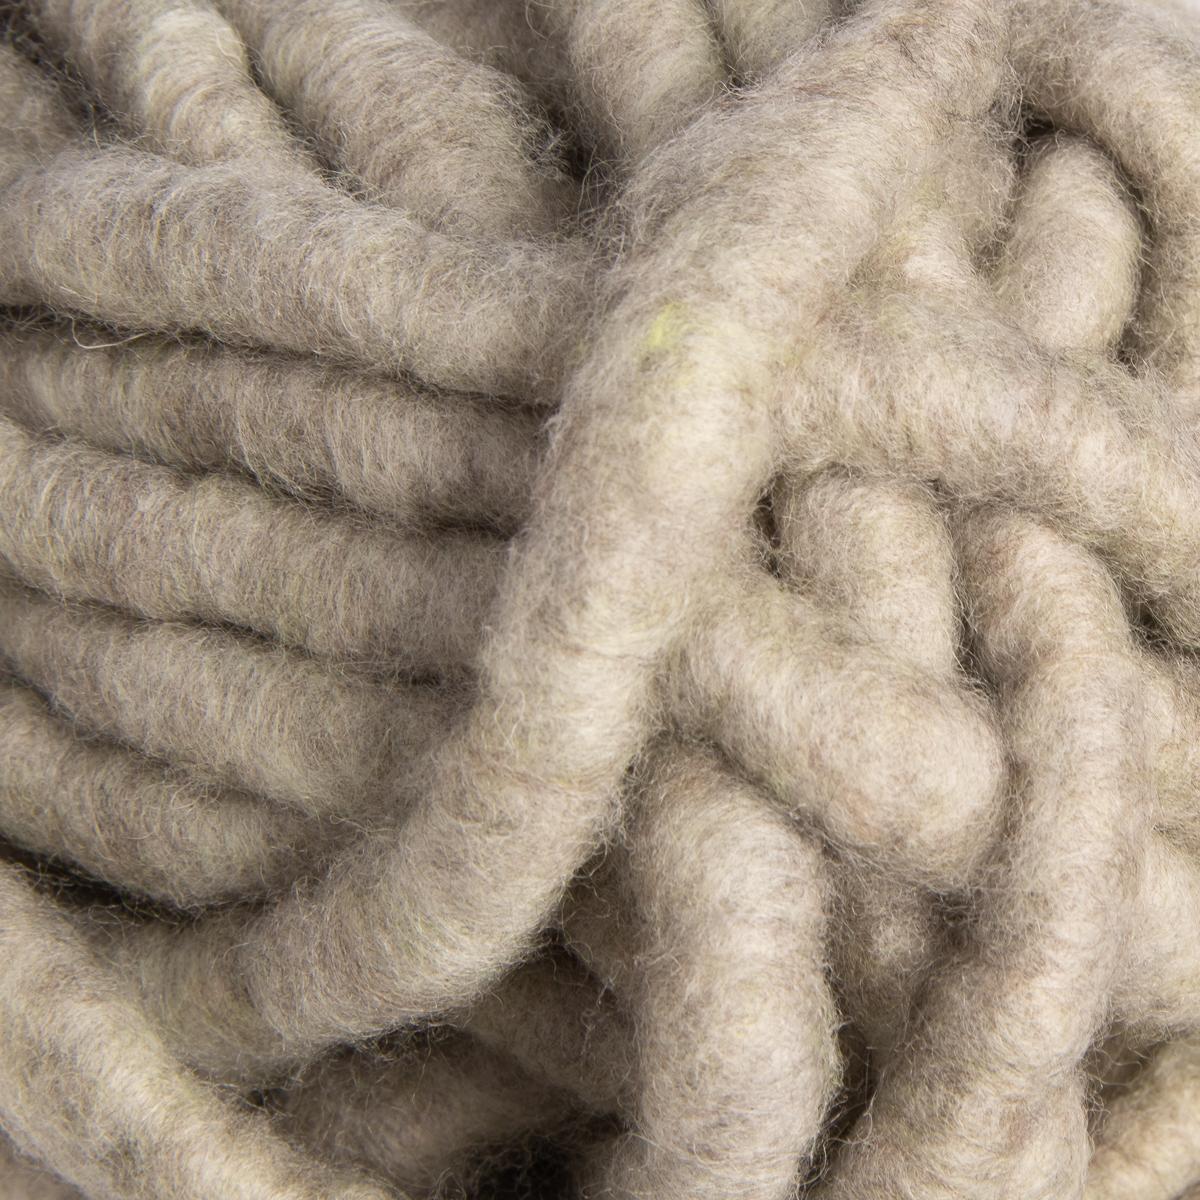 3pk-Lion-Brand-Wow-Acrylic-amp-Wool-yarn-Jumbo-7-Knitting-Crocheting-Skeins-Soft thumbnail 21